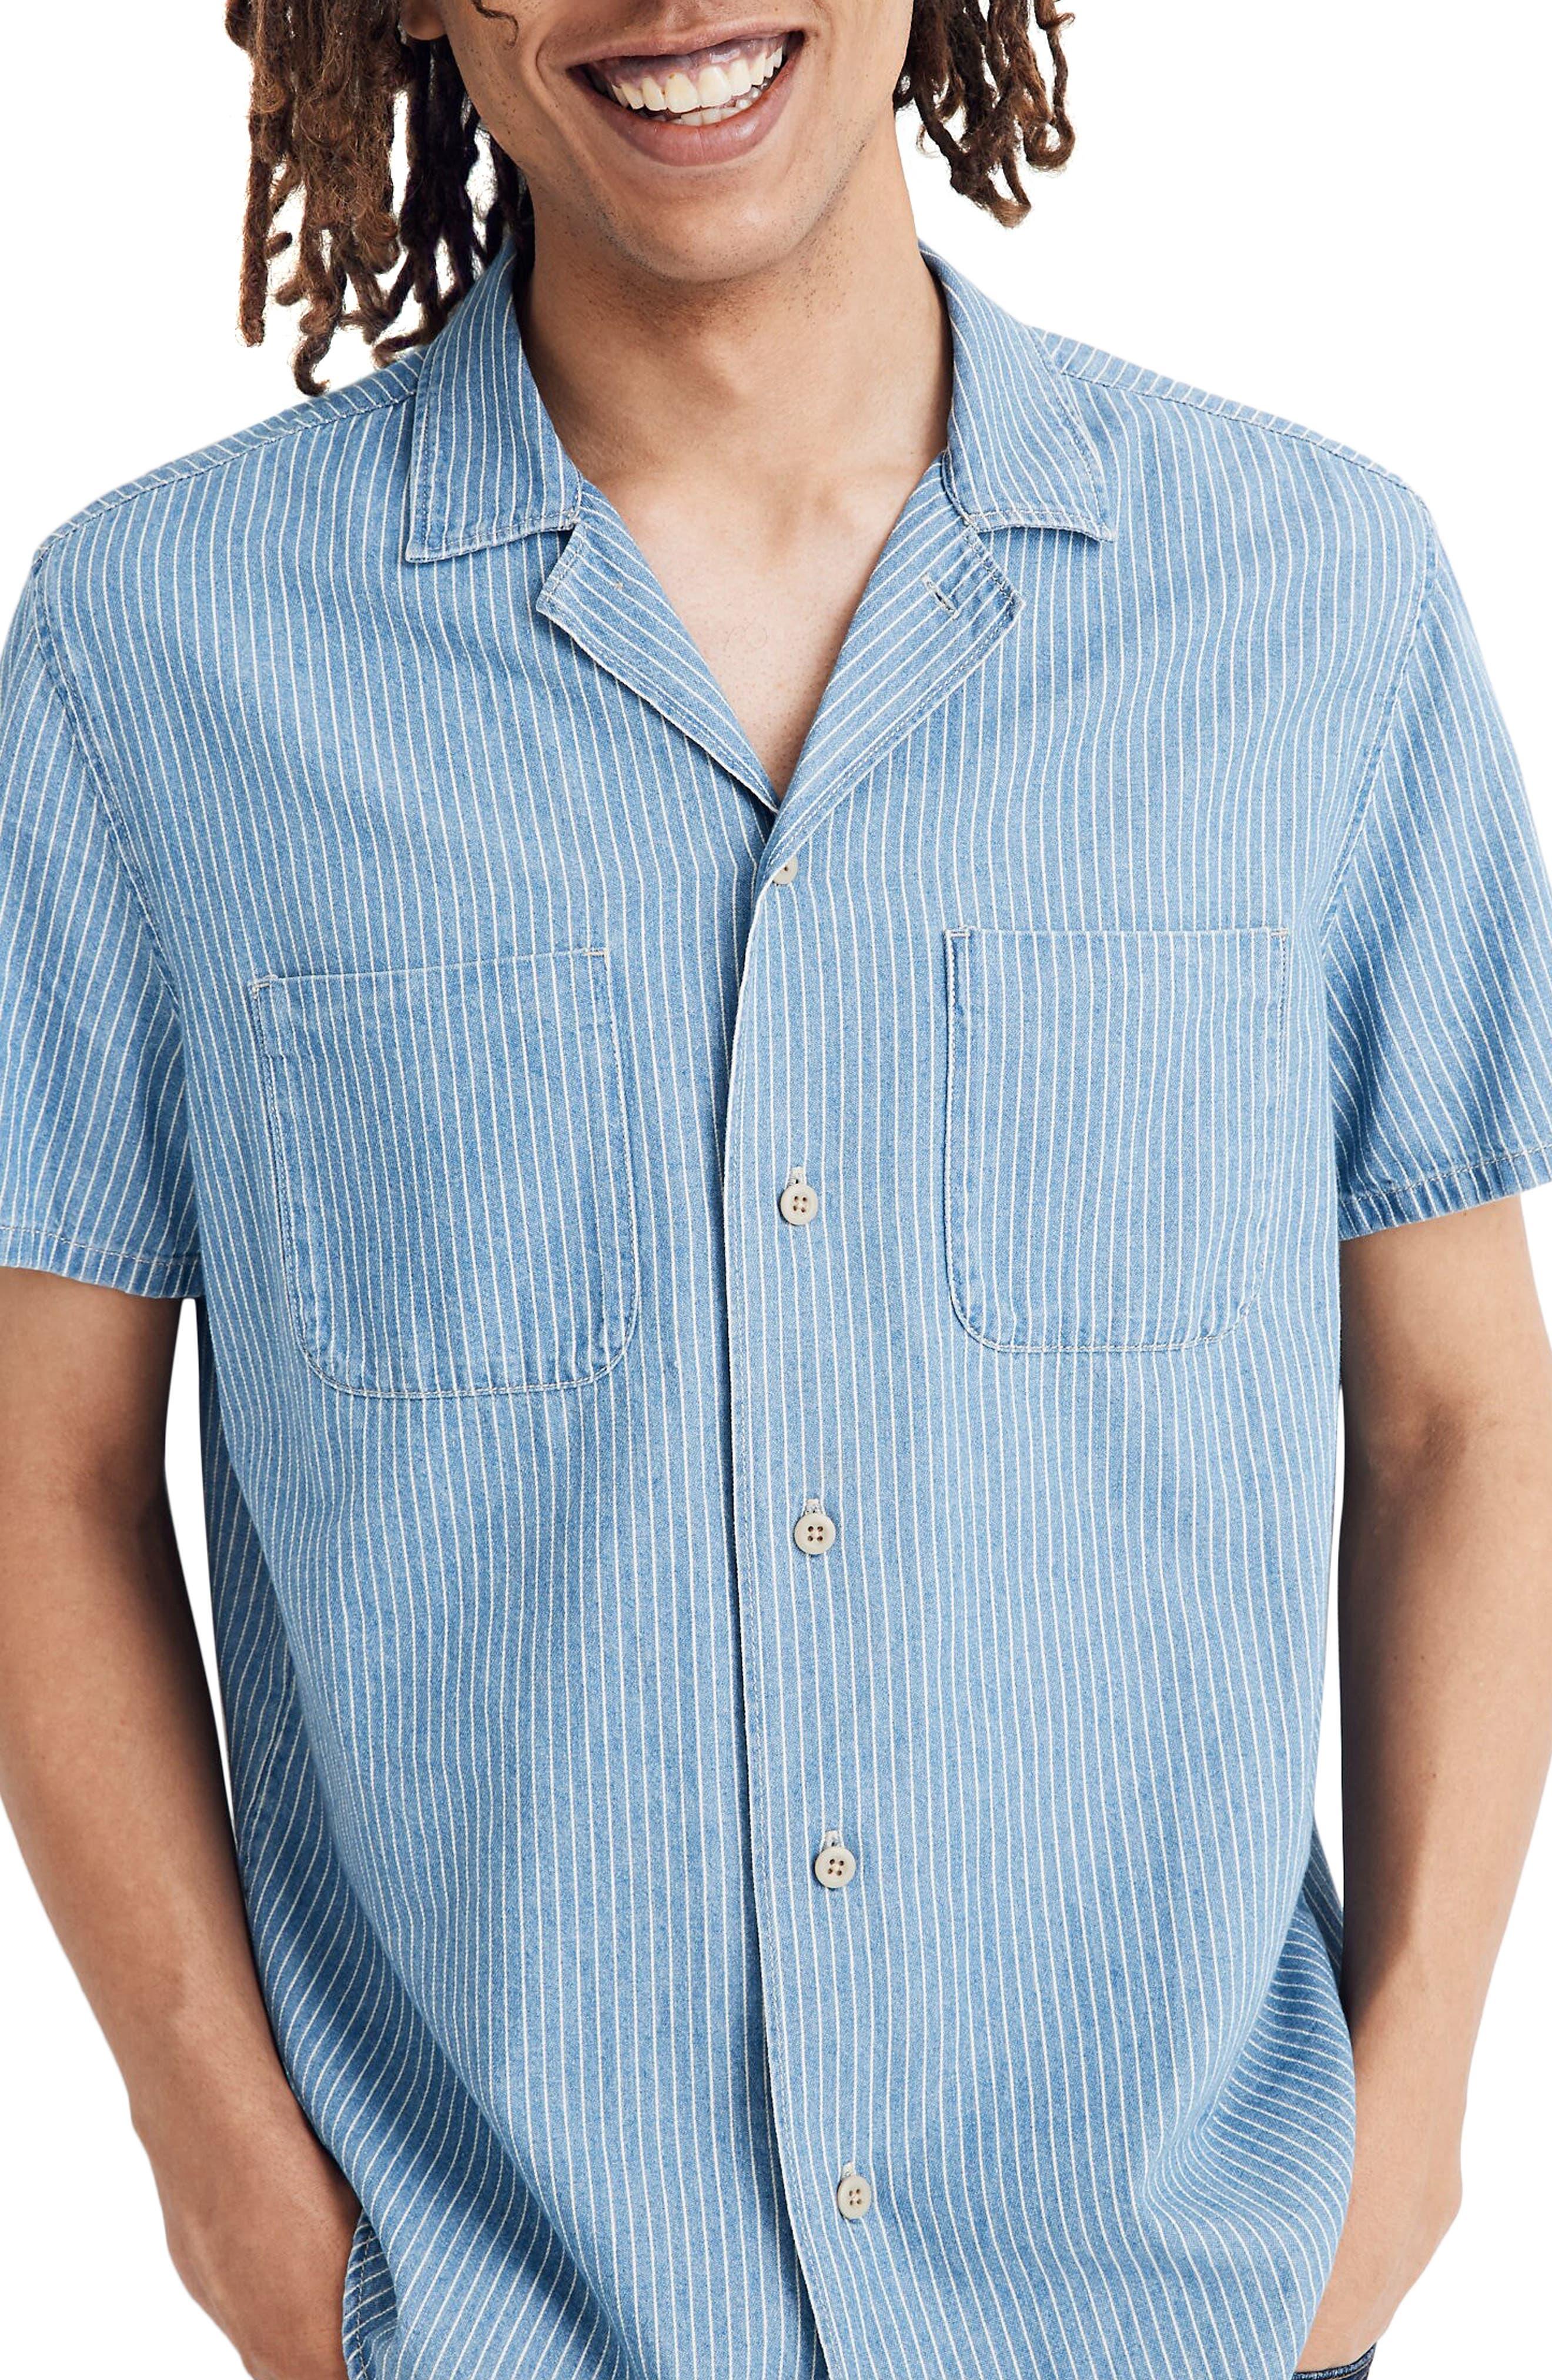 Mens Vintage Shirts – Retro Shirts Mens Madewell Easy Indigo Railroad Stripe Camp Shirt Size X-Small - Blue $47.70 AT vintagedancer.com